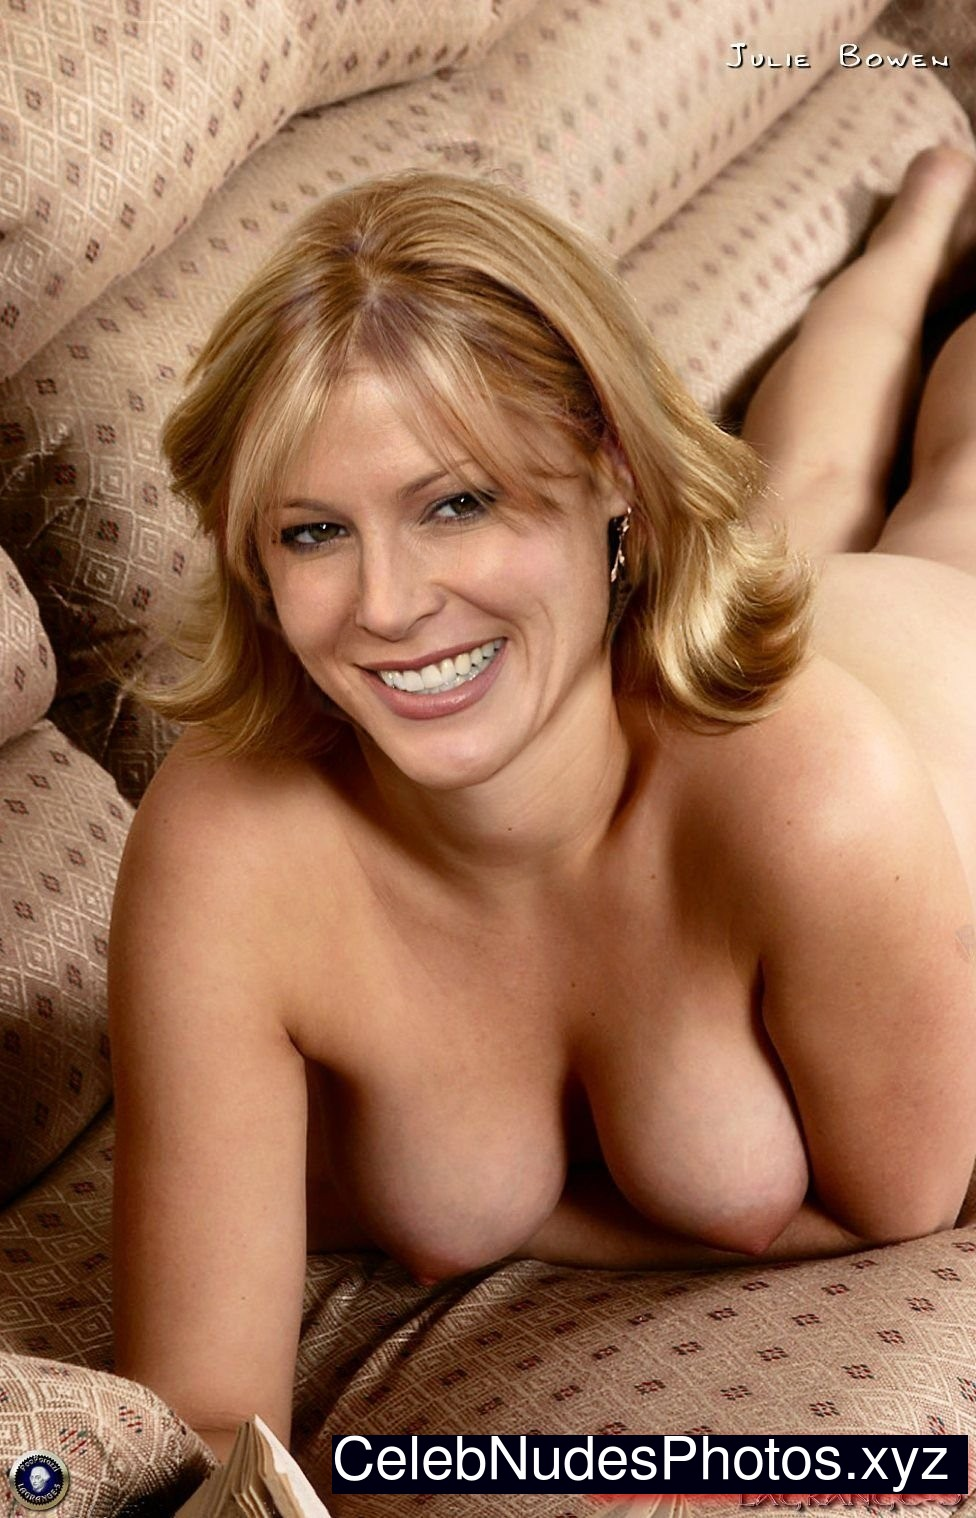 Julie Bowen Best Celebrity Nude sexy 25